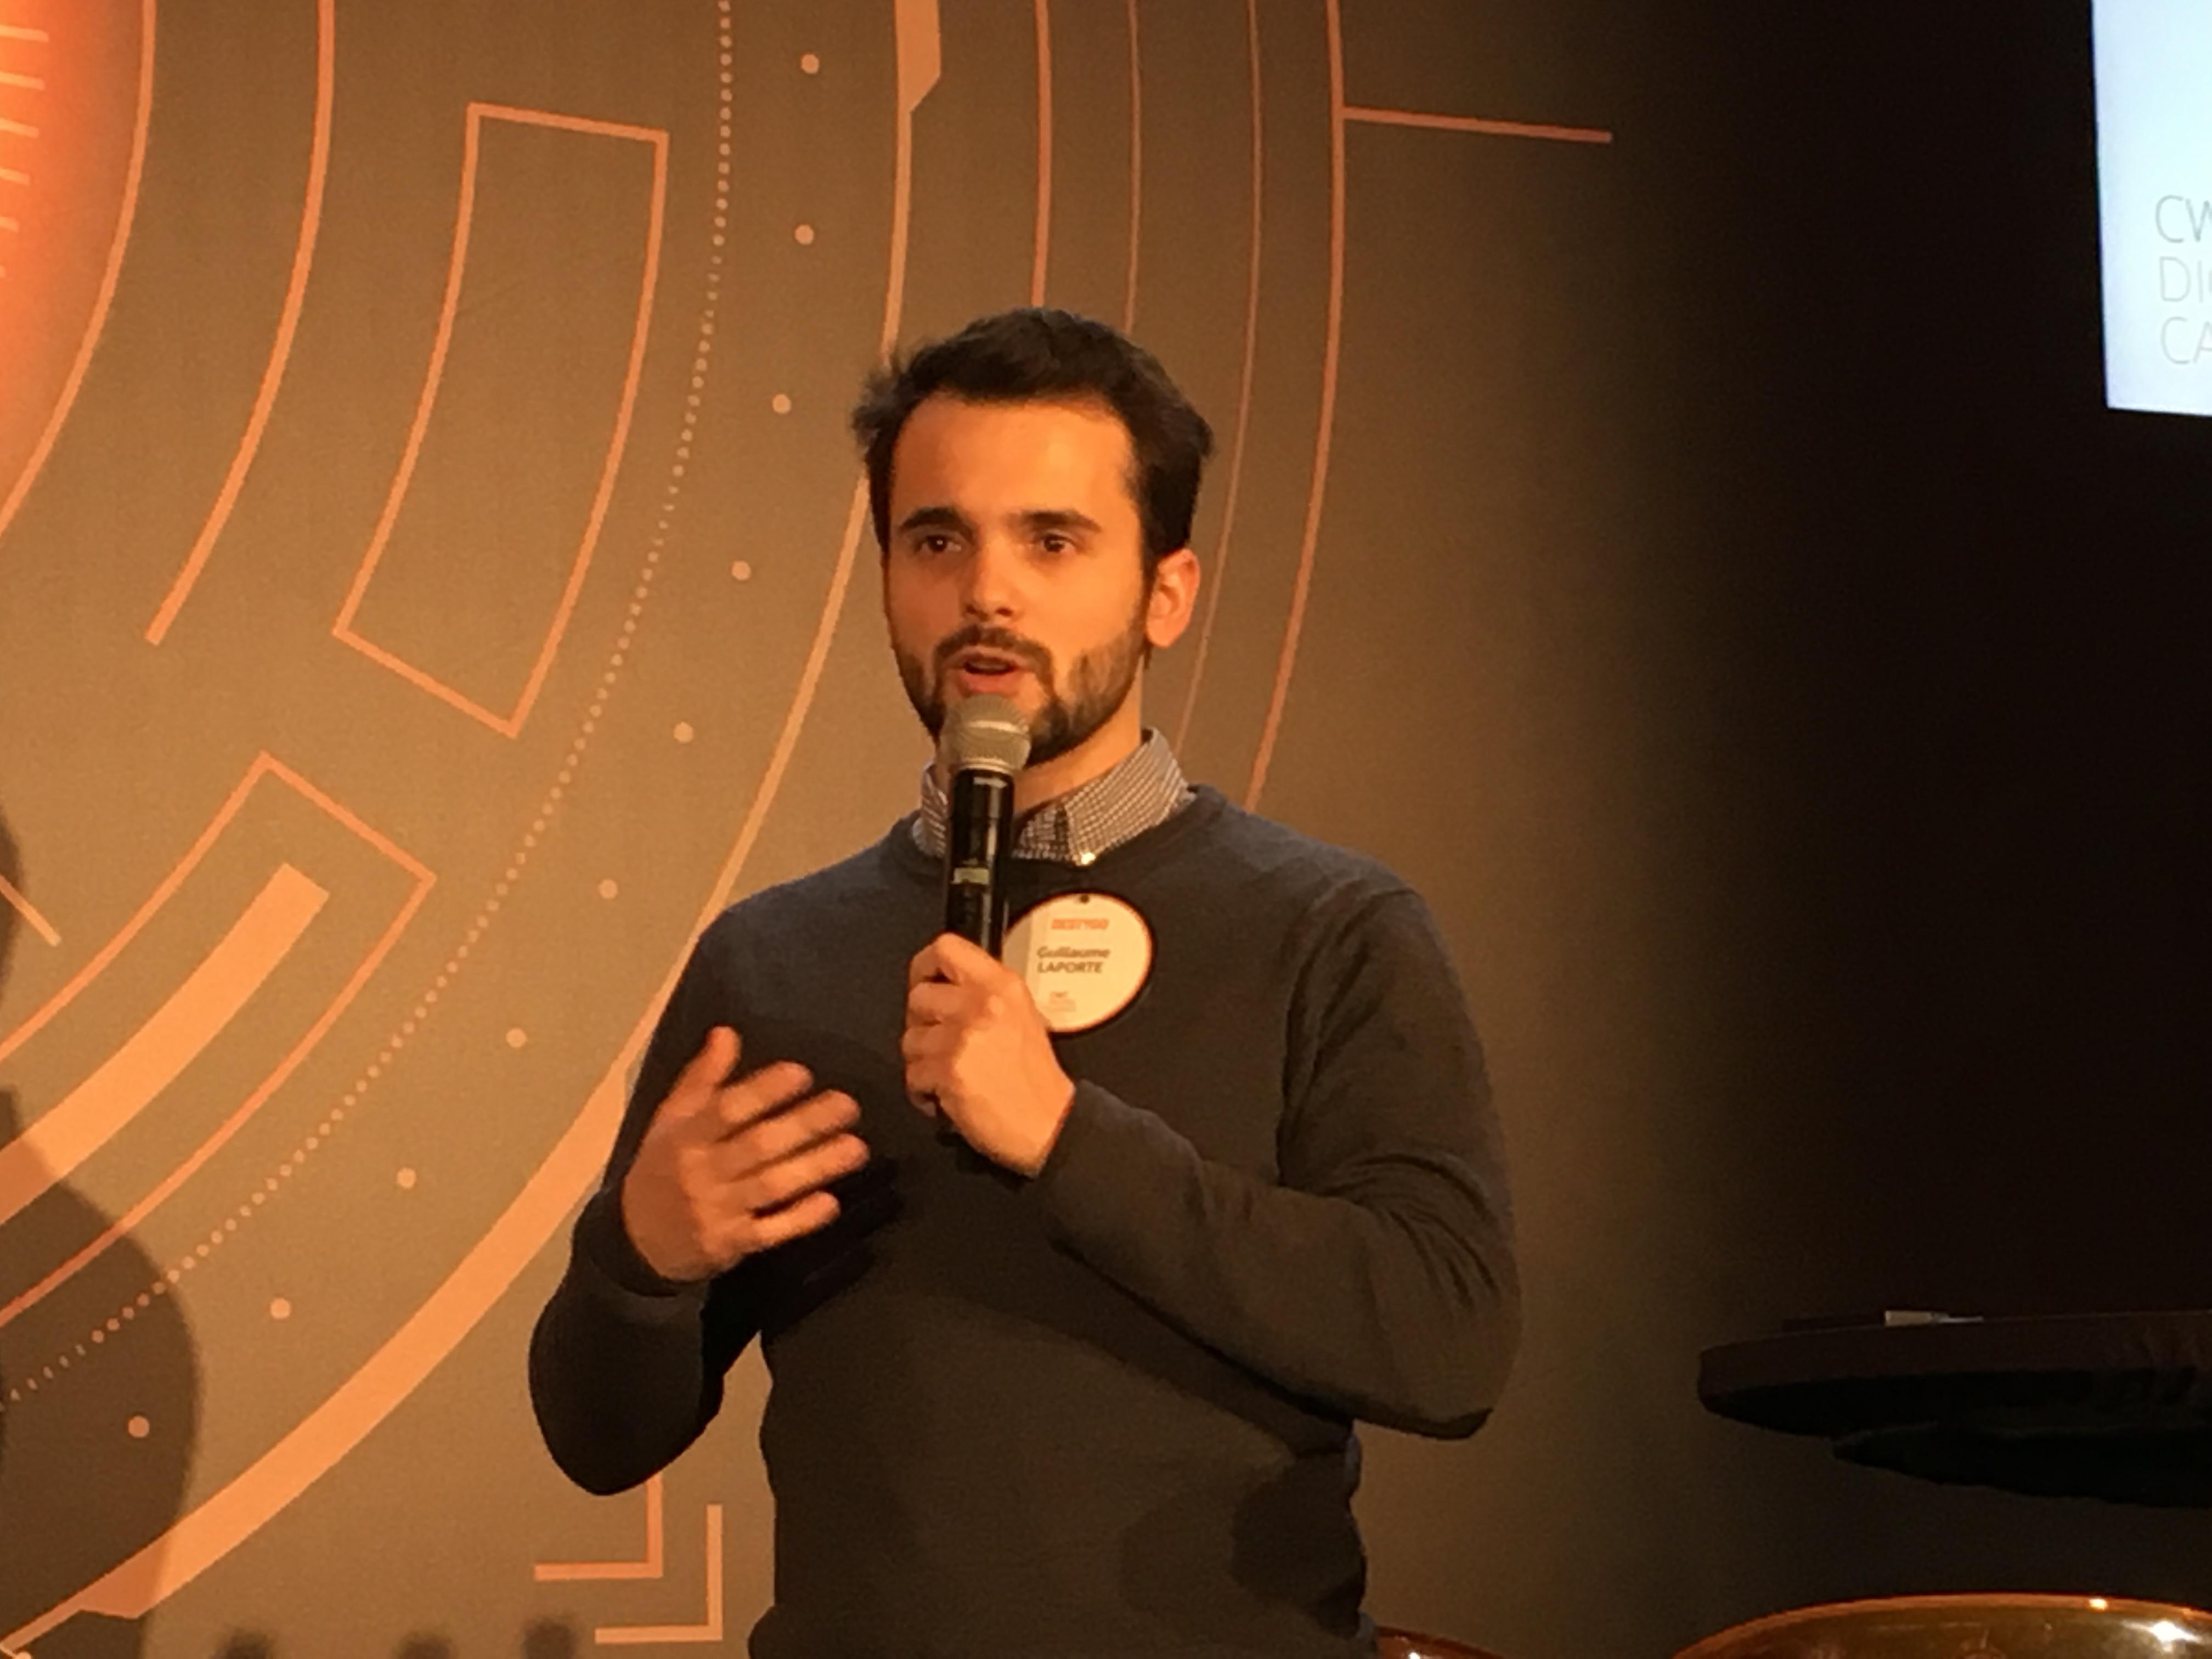 Guillaume Laporte, CEO Destygo. - CL